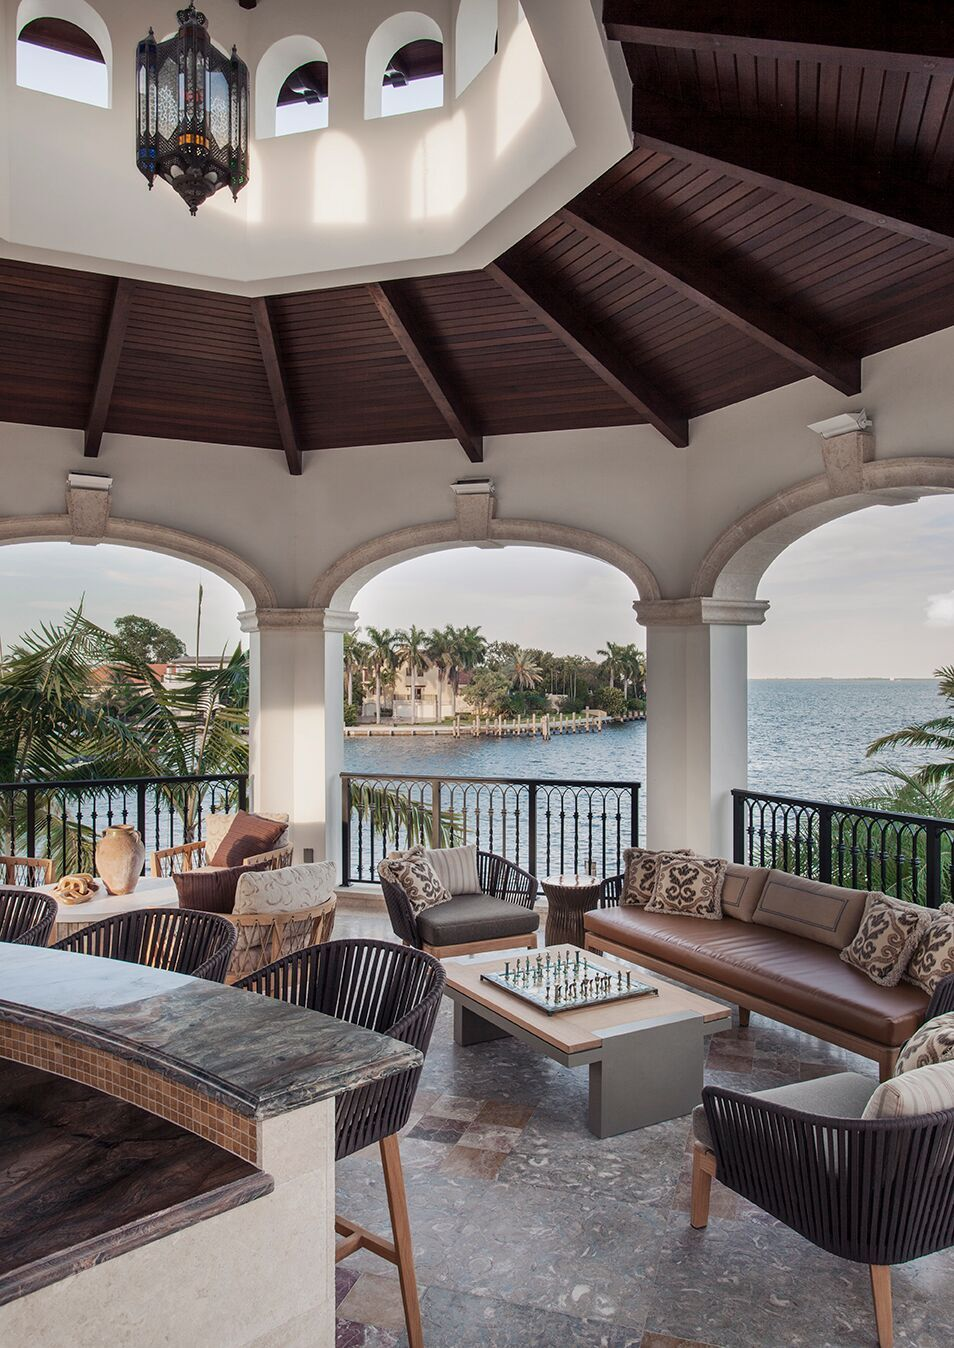 Top Miami Interior Designers - B Pila Design - Artistic Villa - Master Bedroom Outdoor Gazebo - master bedroom porches - luxury outdoor furniture